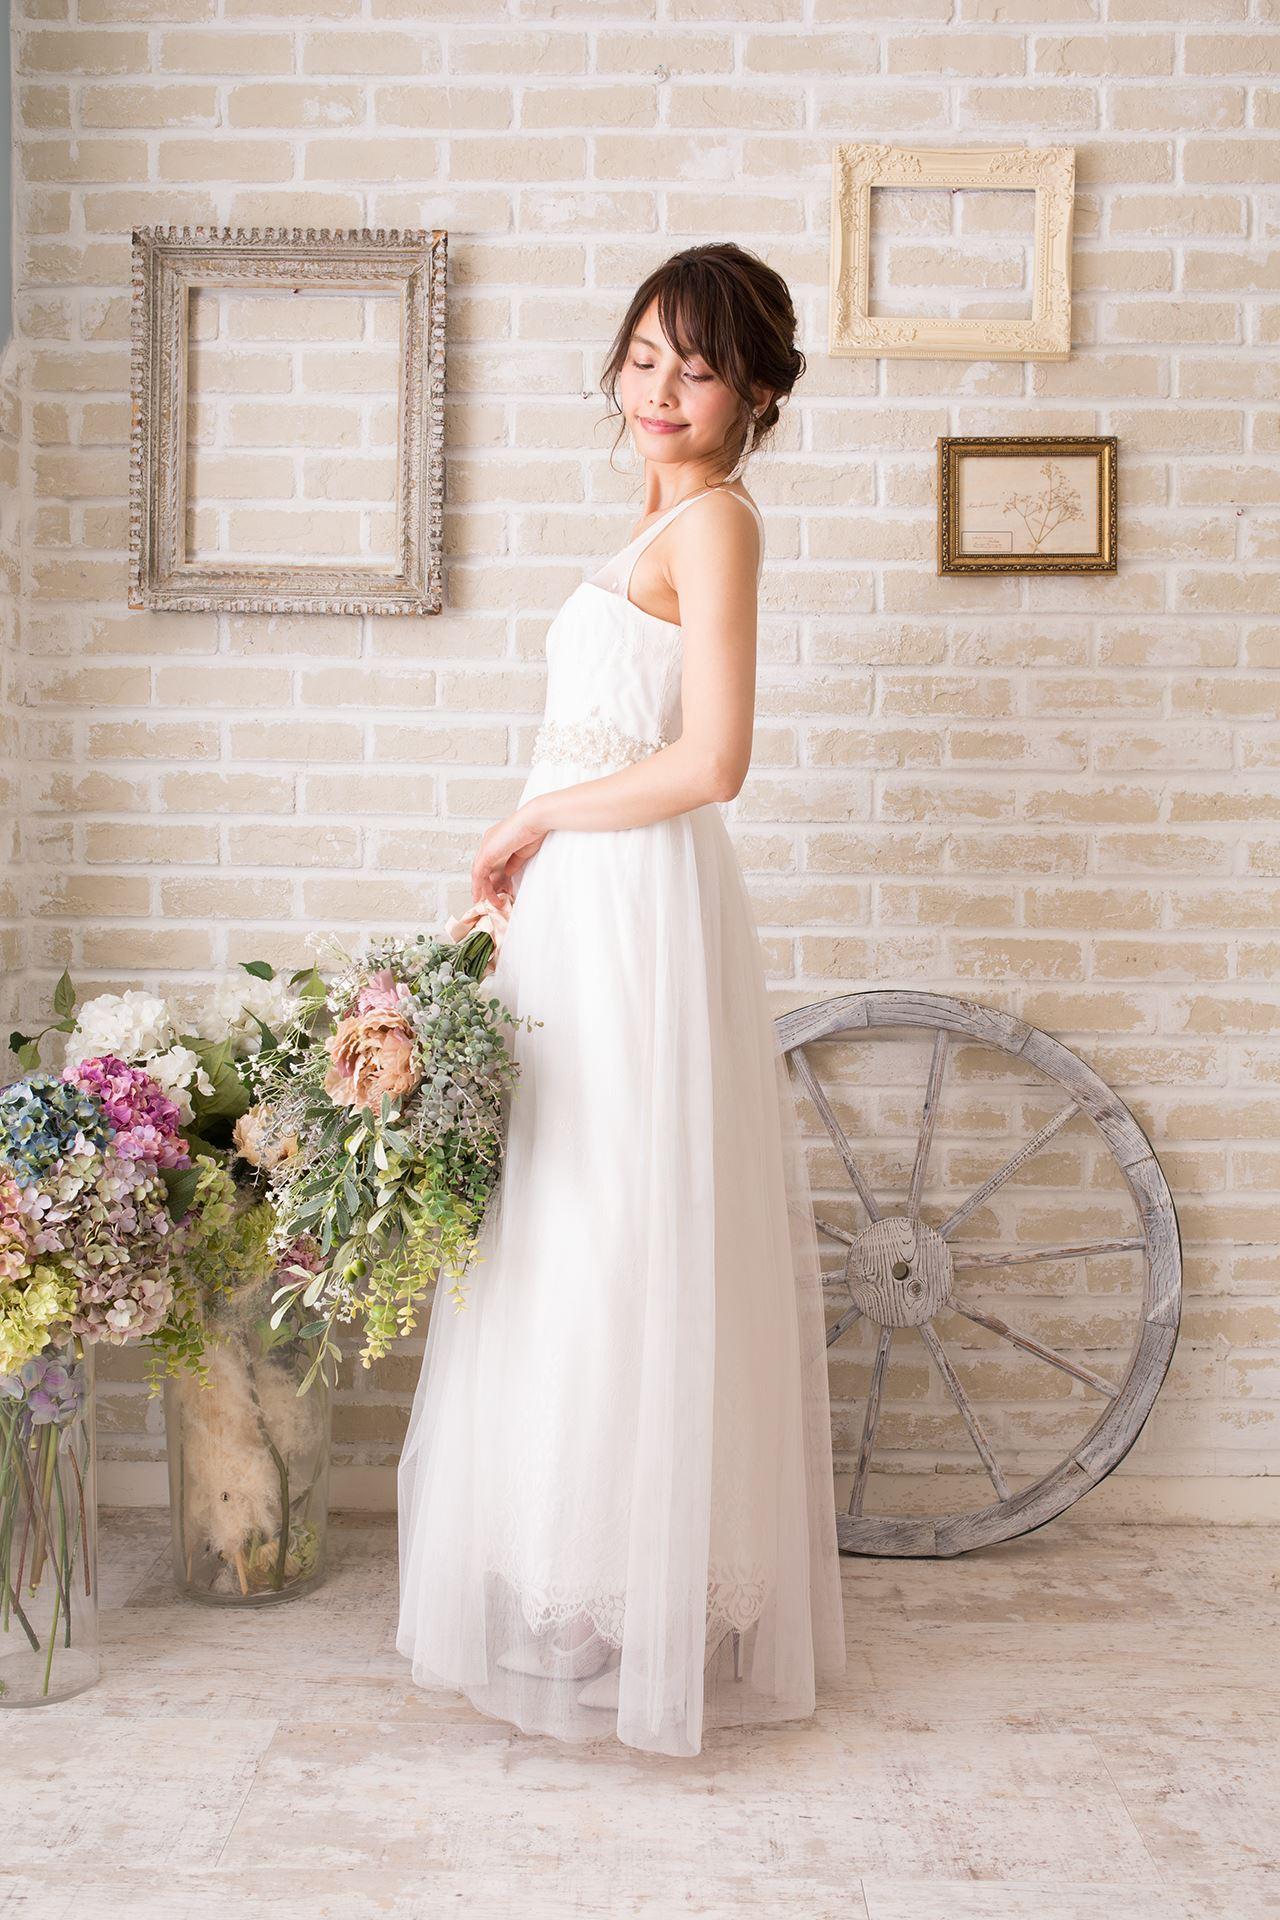 yk_nr_dress_443